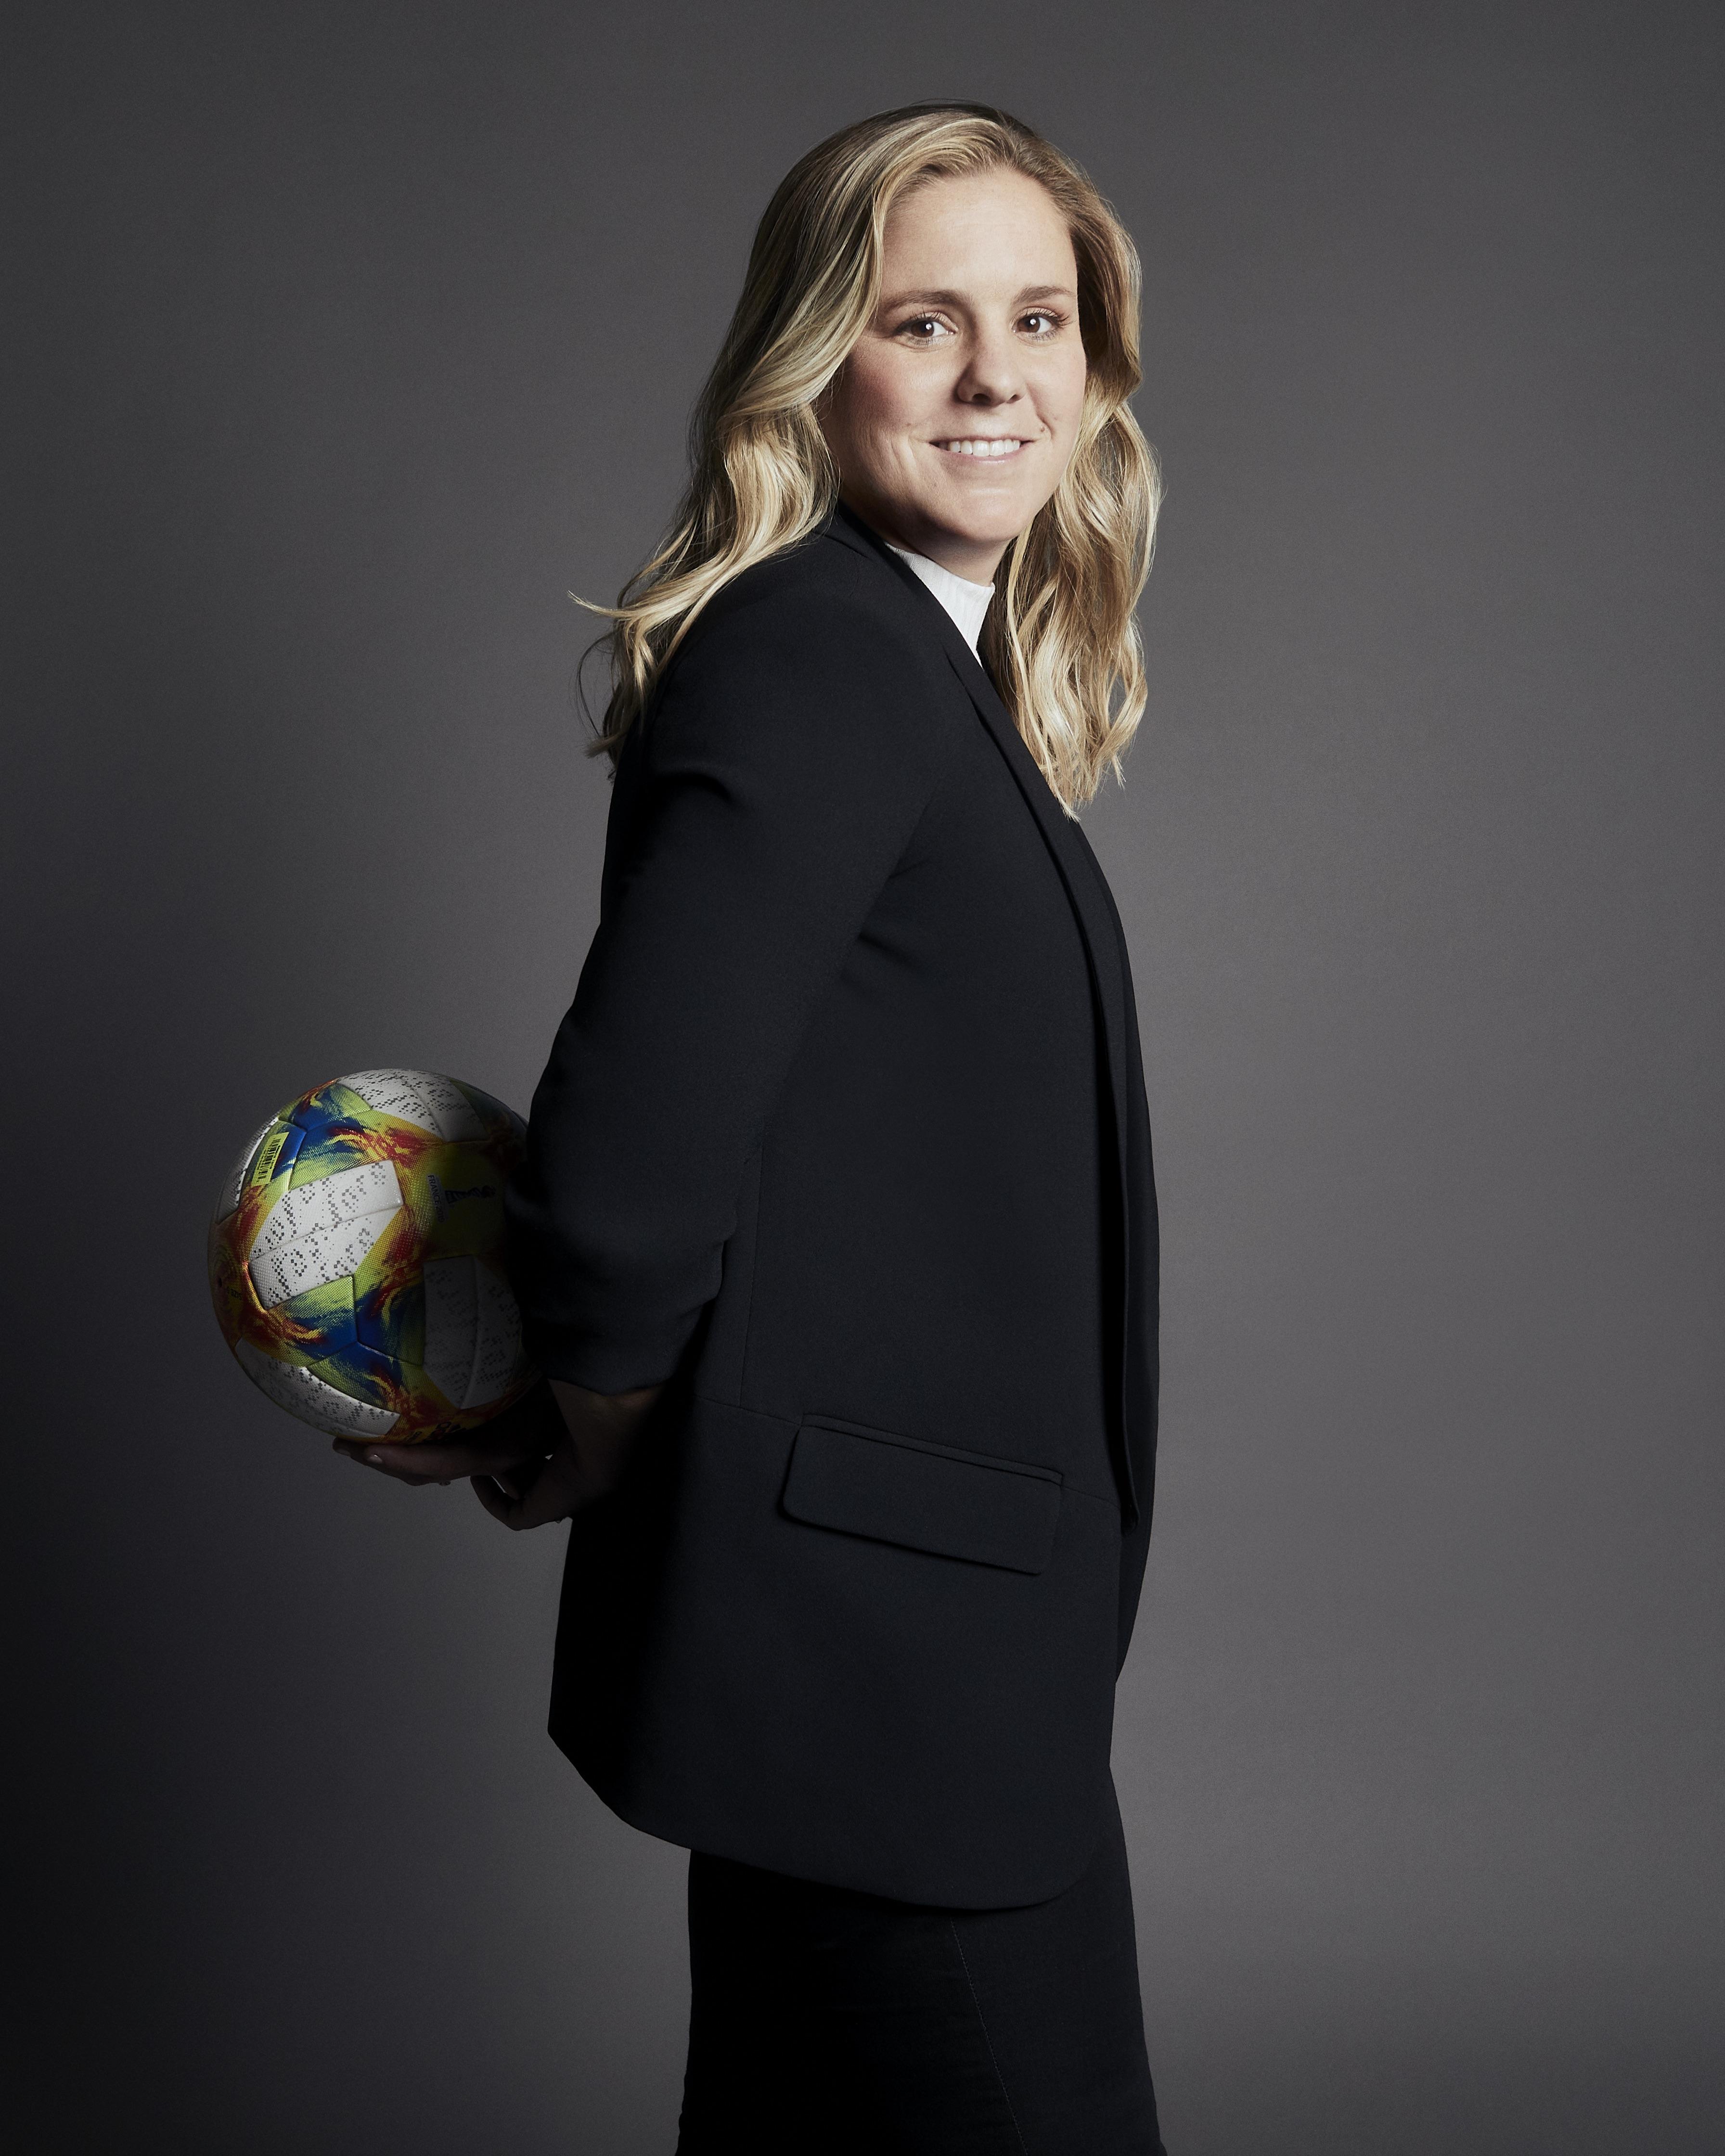 Womens World Cup x Fox News